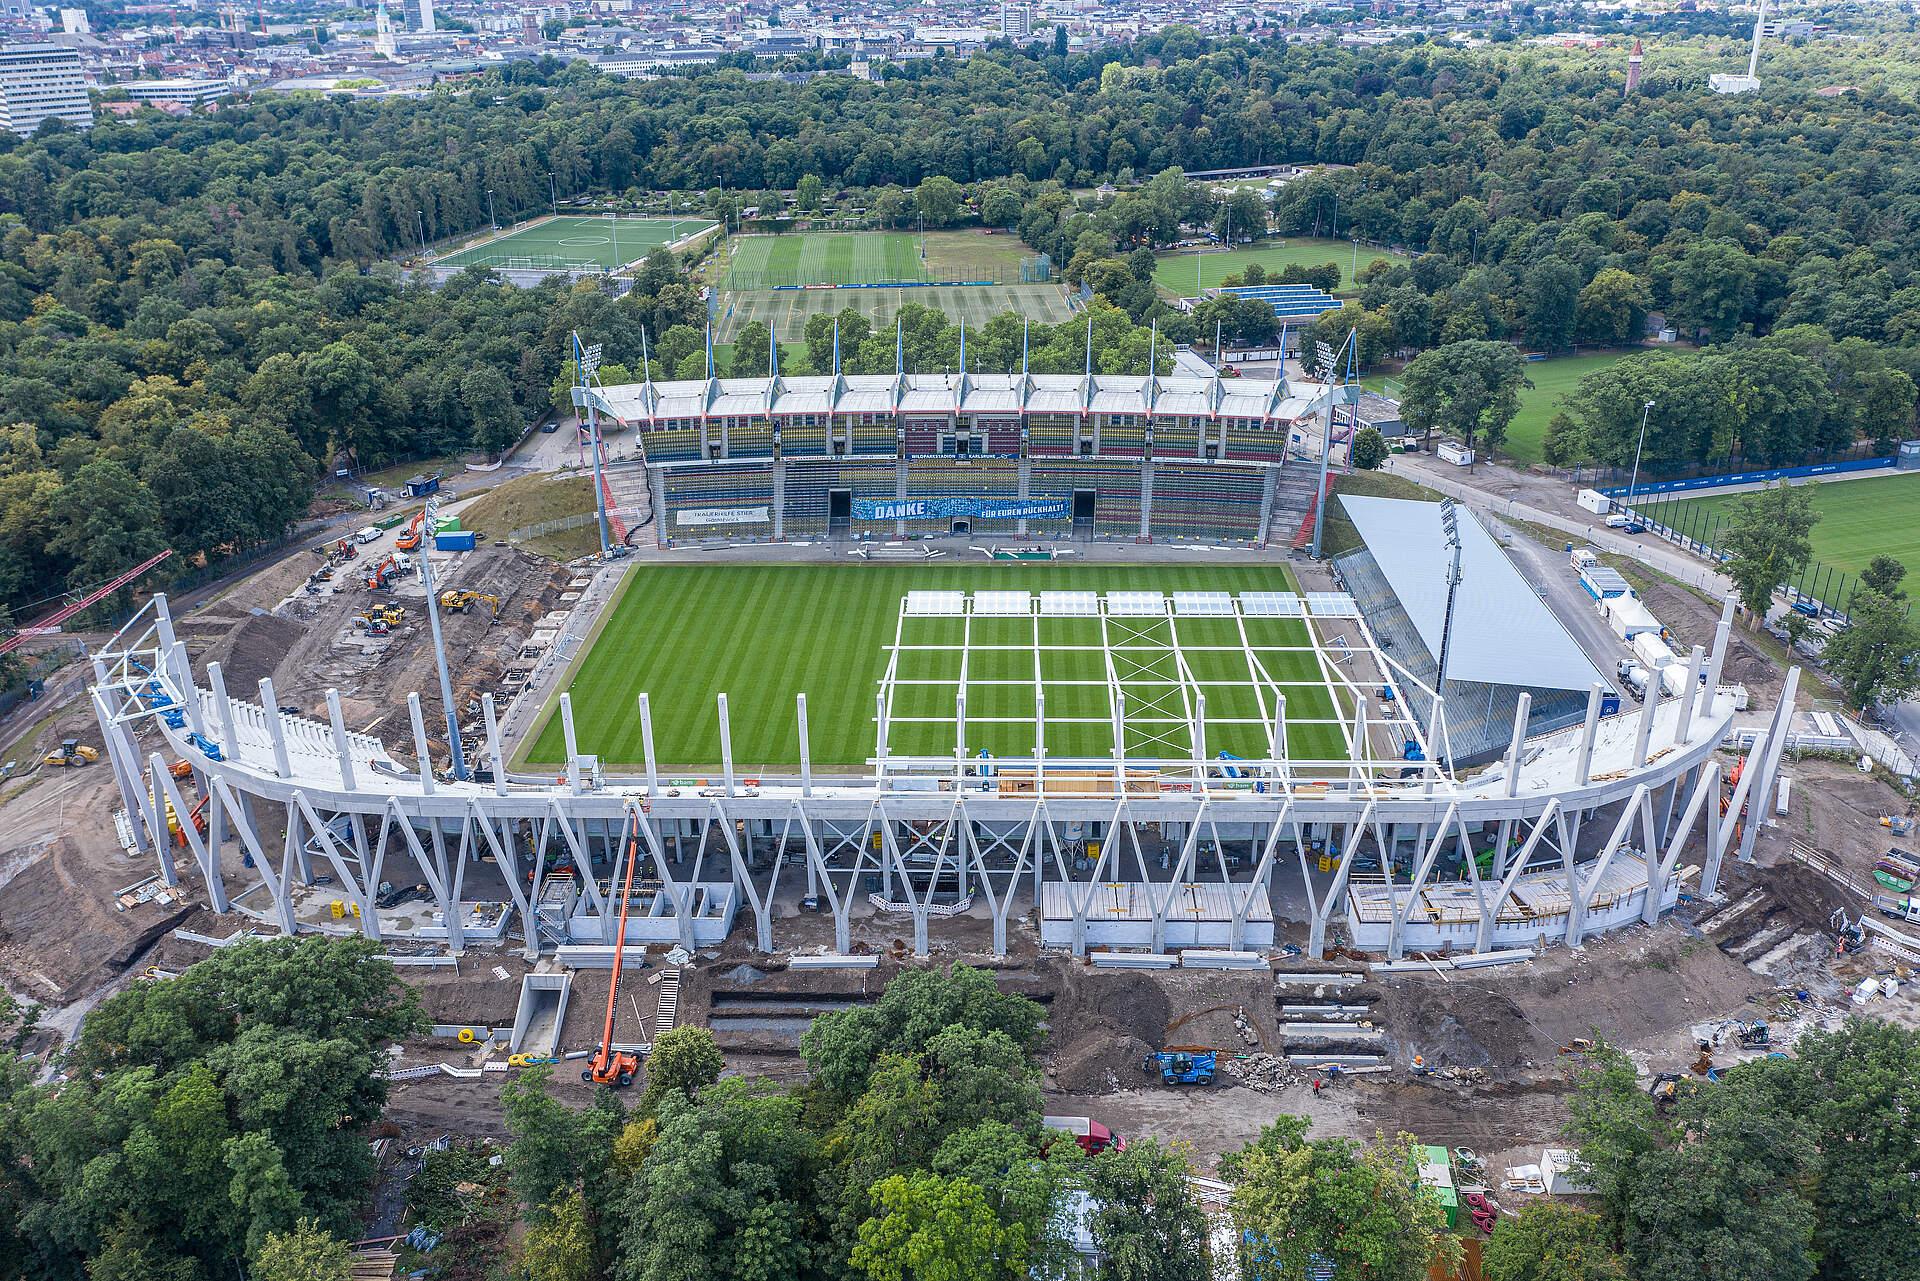 Stadionneubau Ksc